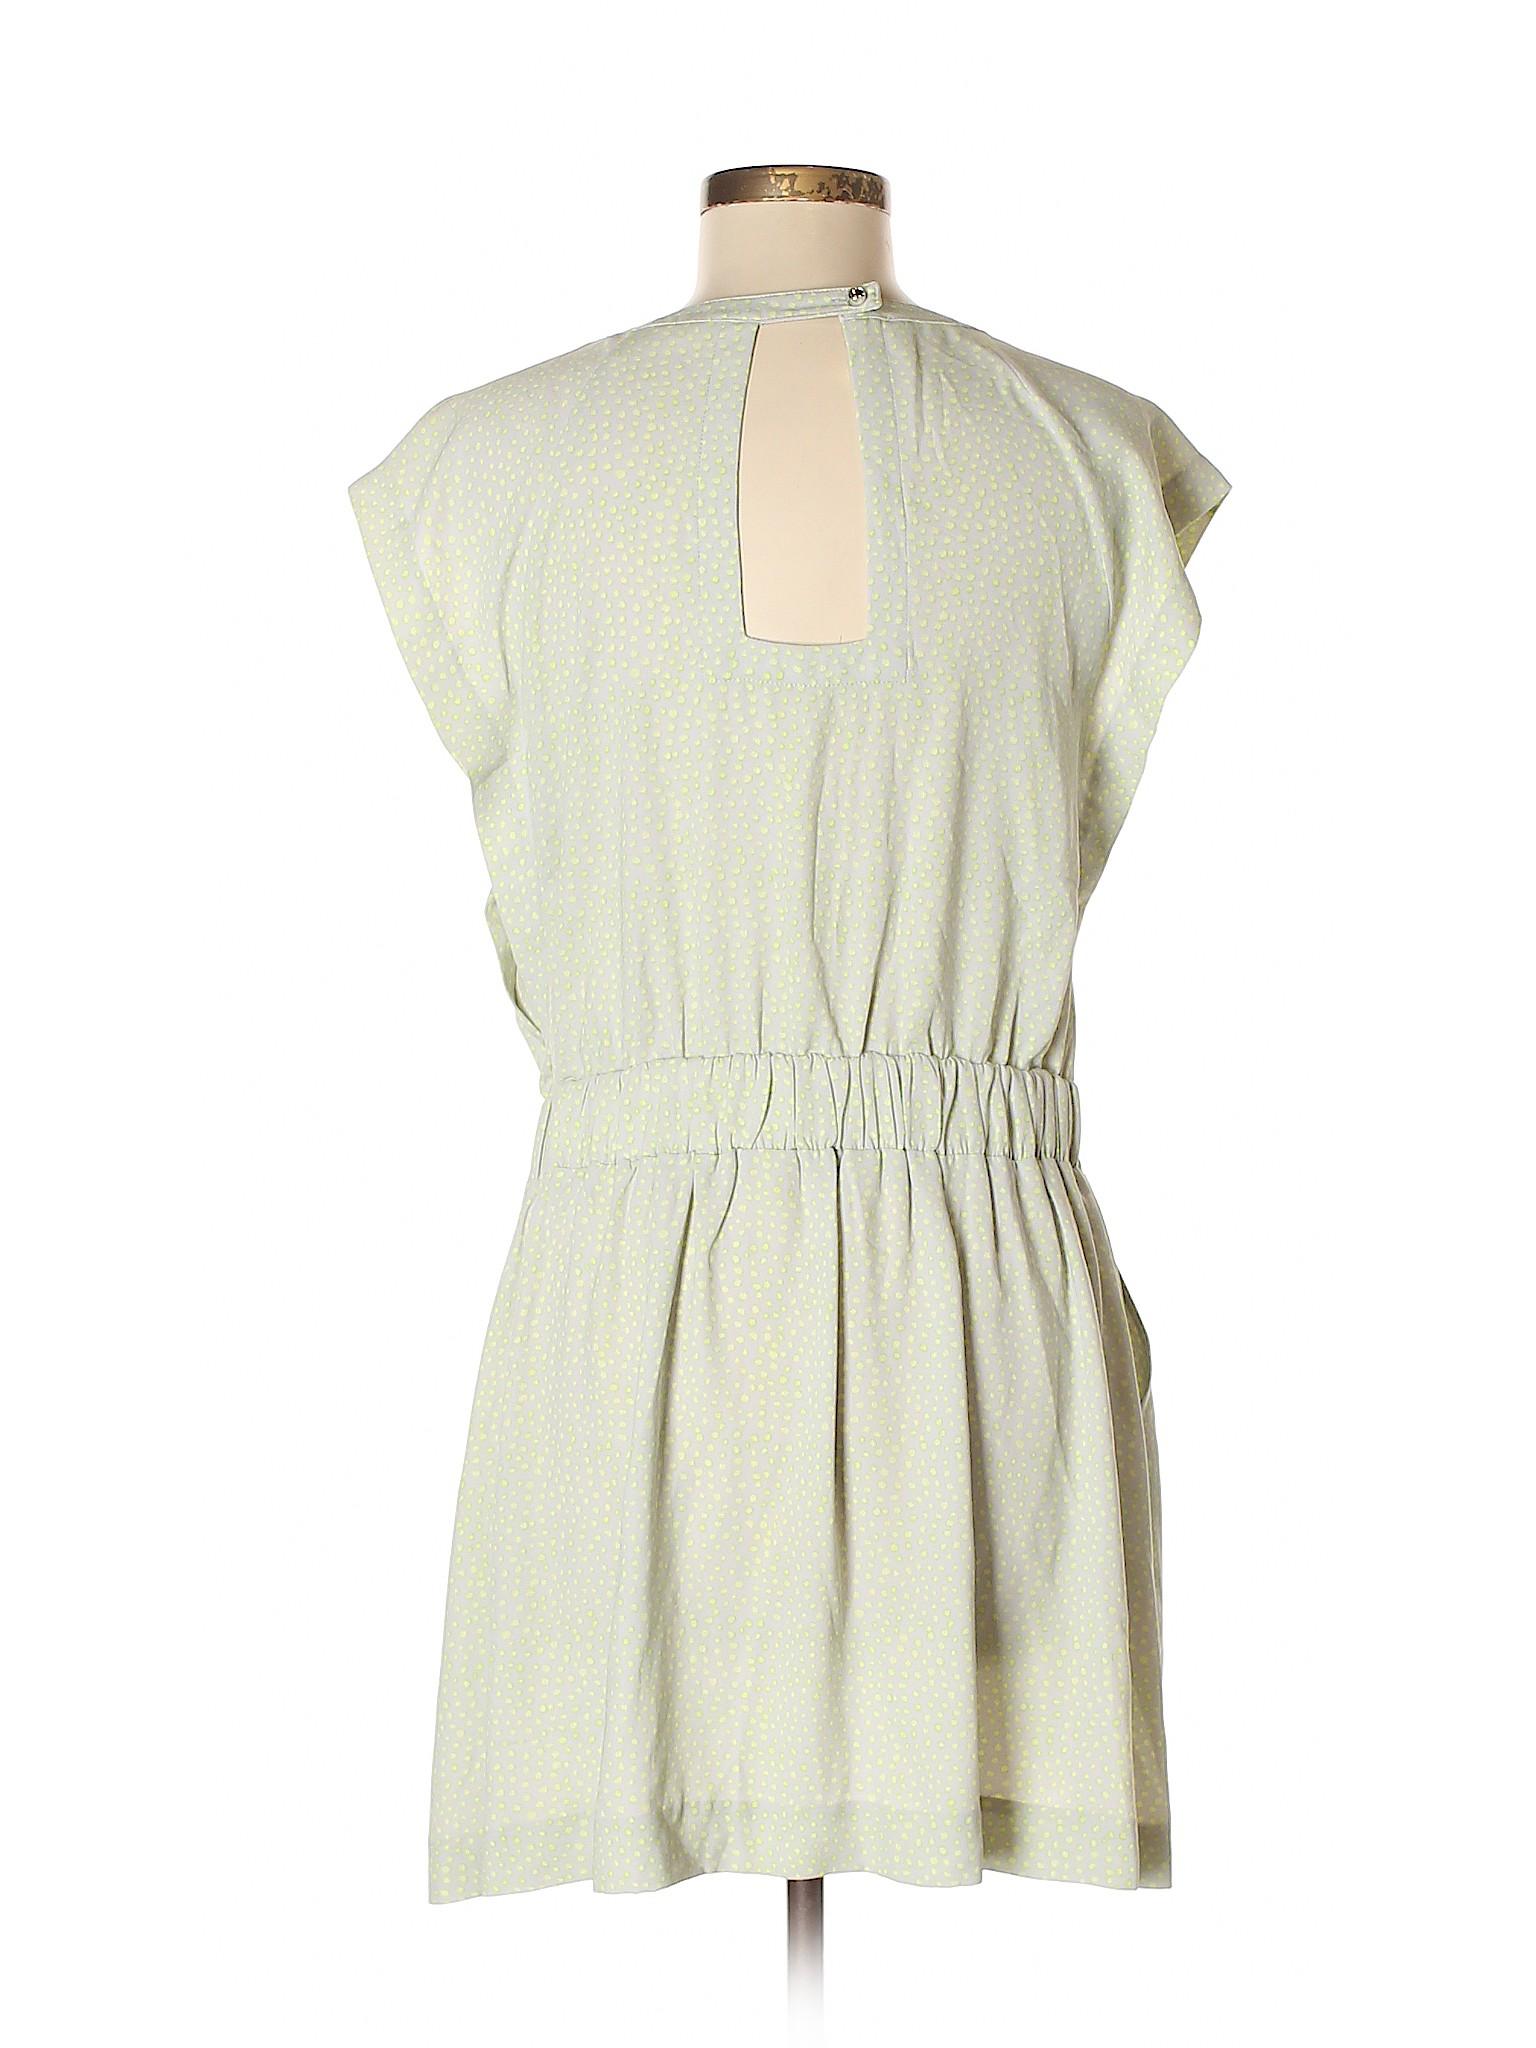 RACHEL Roy Dress winter Casual Boutique Rachel 5wqA6aCtx